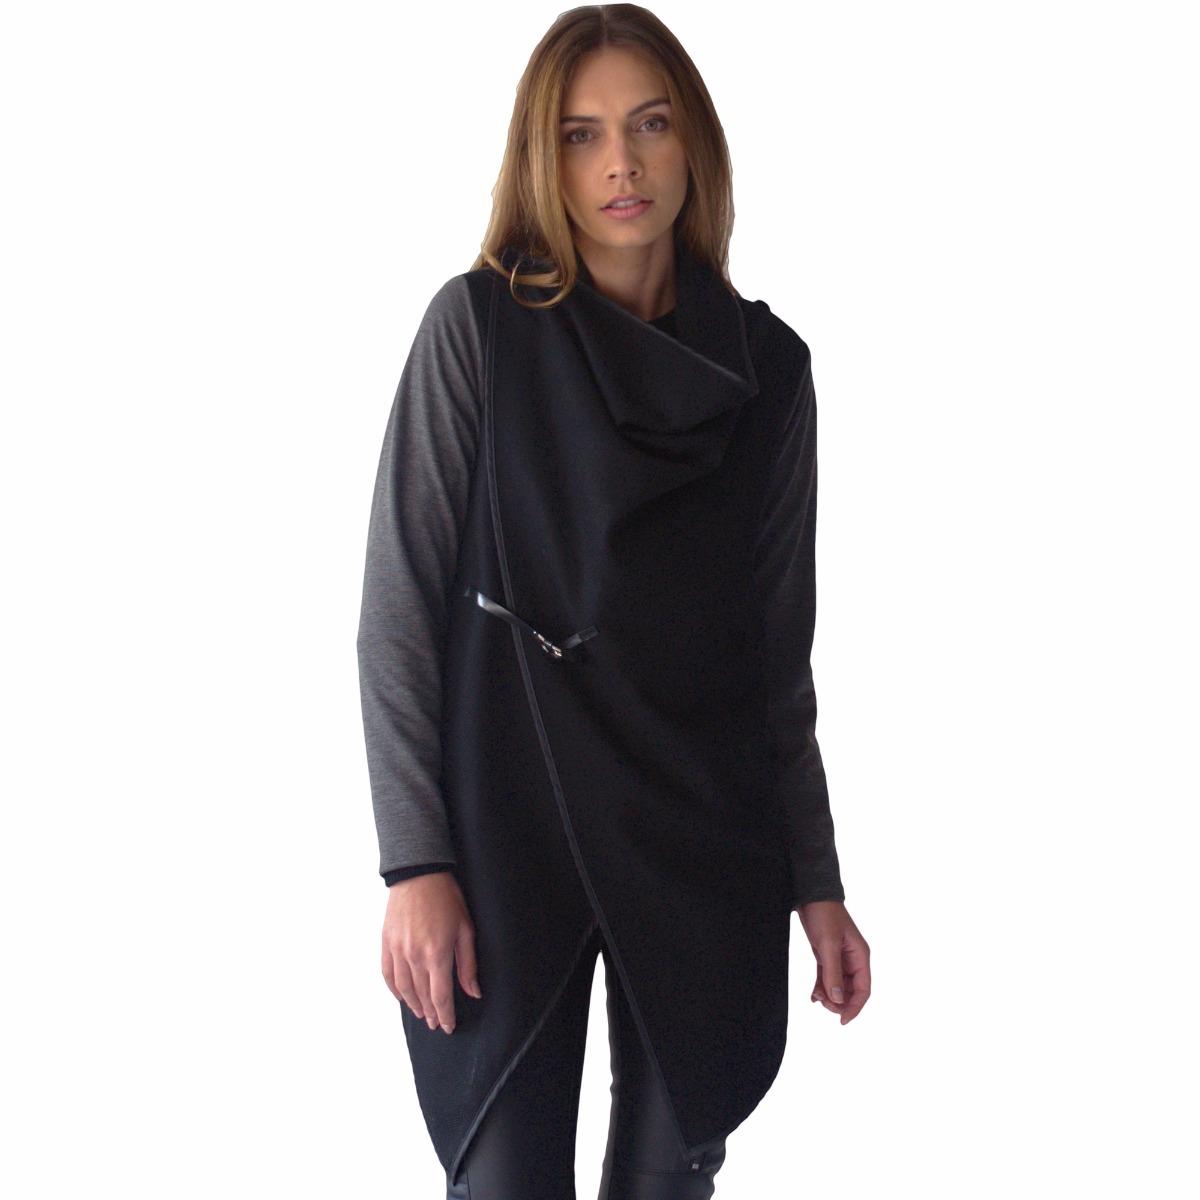 1985bcbc846 abrigo mujer formal casual saco gabardina ligero rack   pack. Cargando zoom...  abrigo mujer gabardina. Cargando zoom.